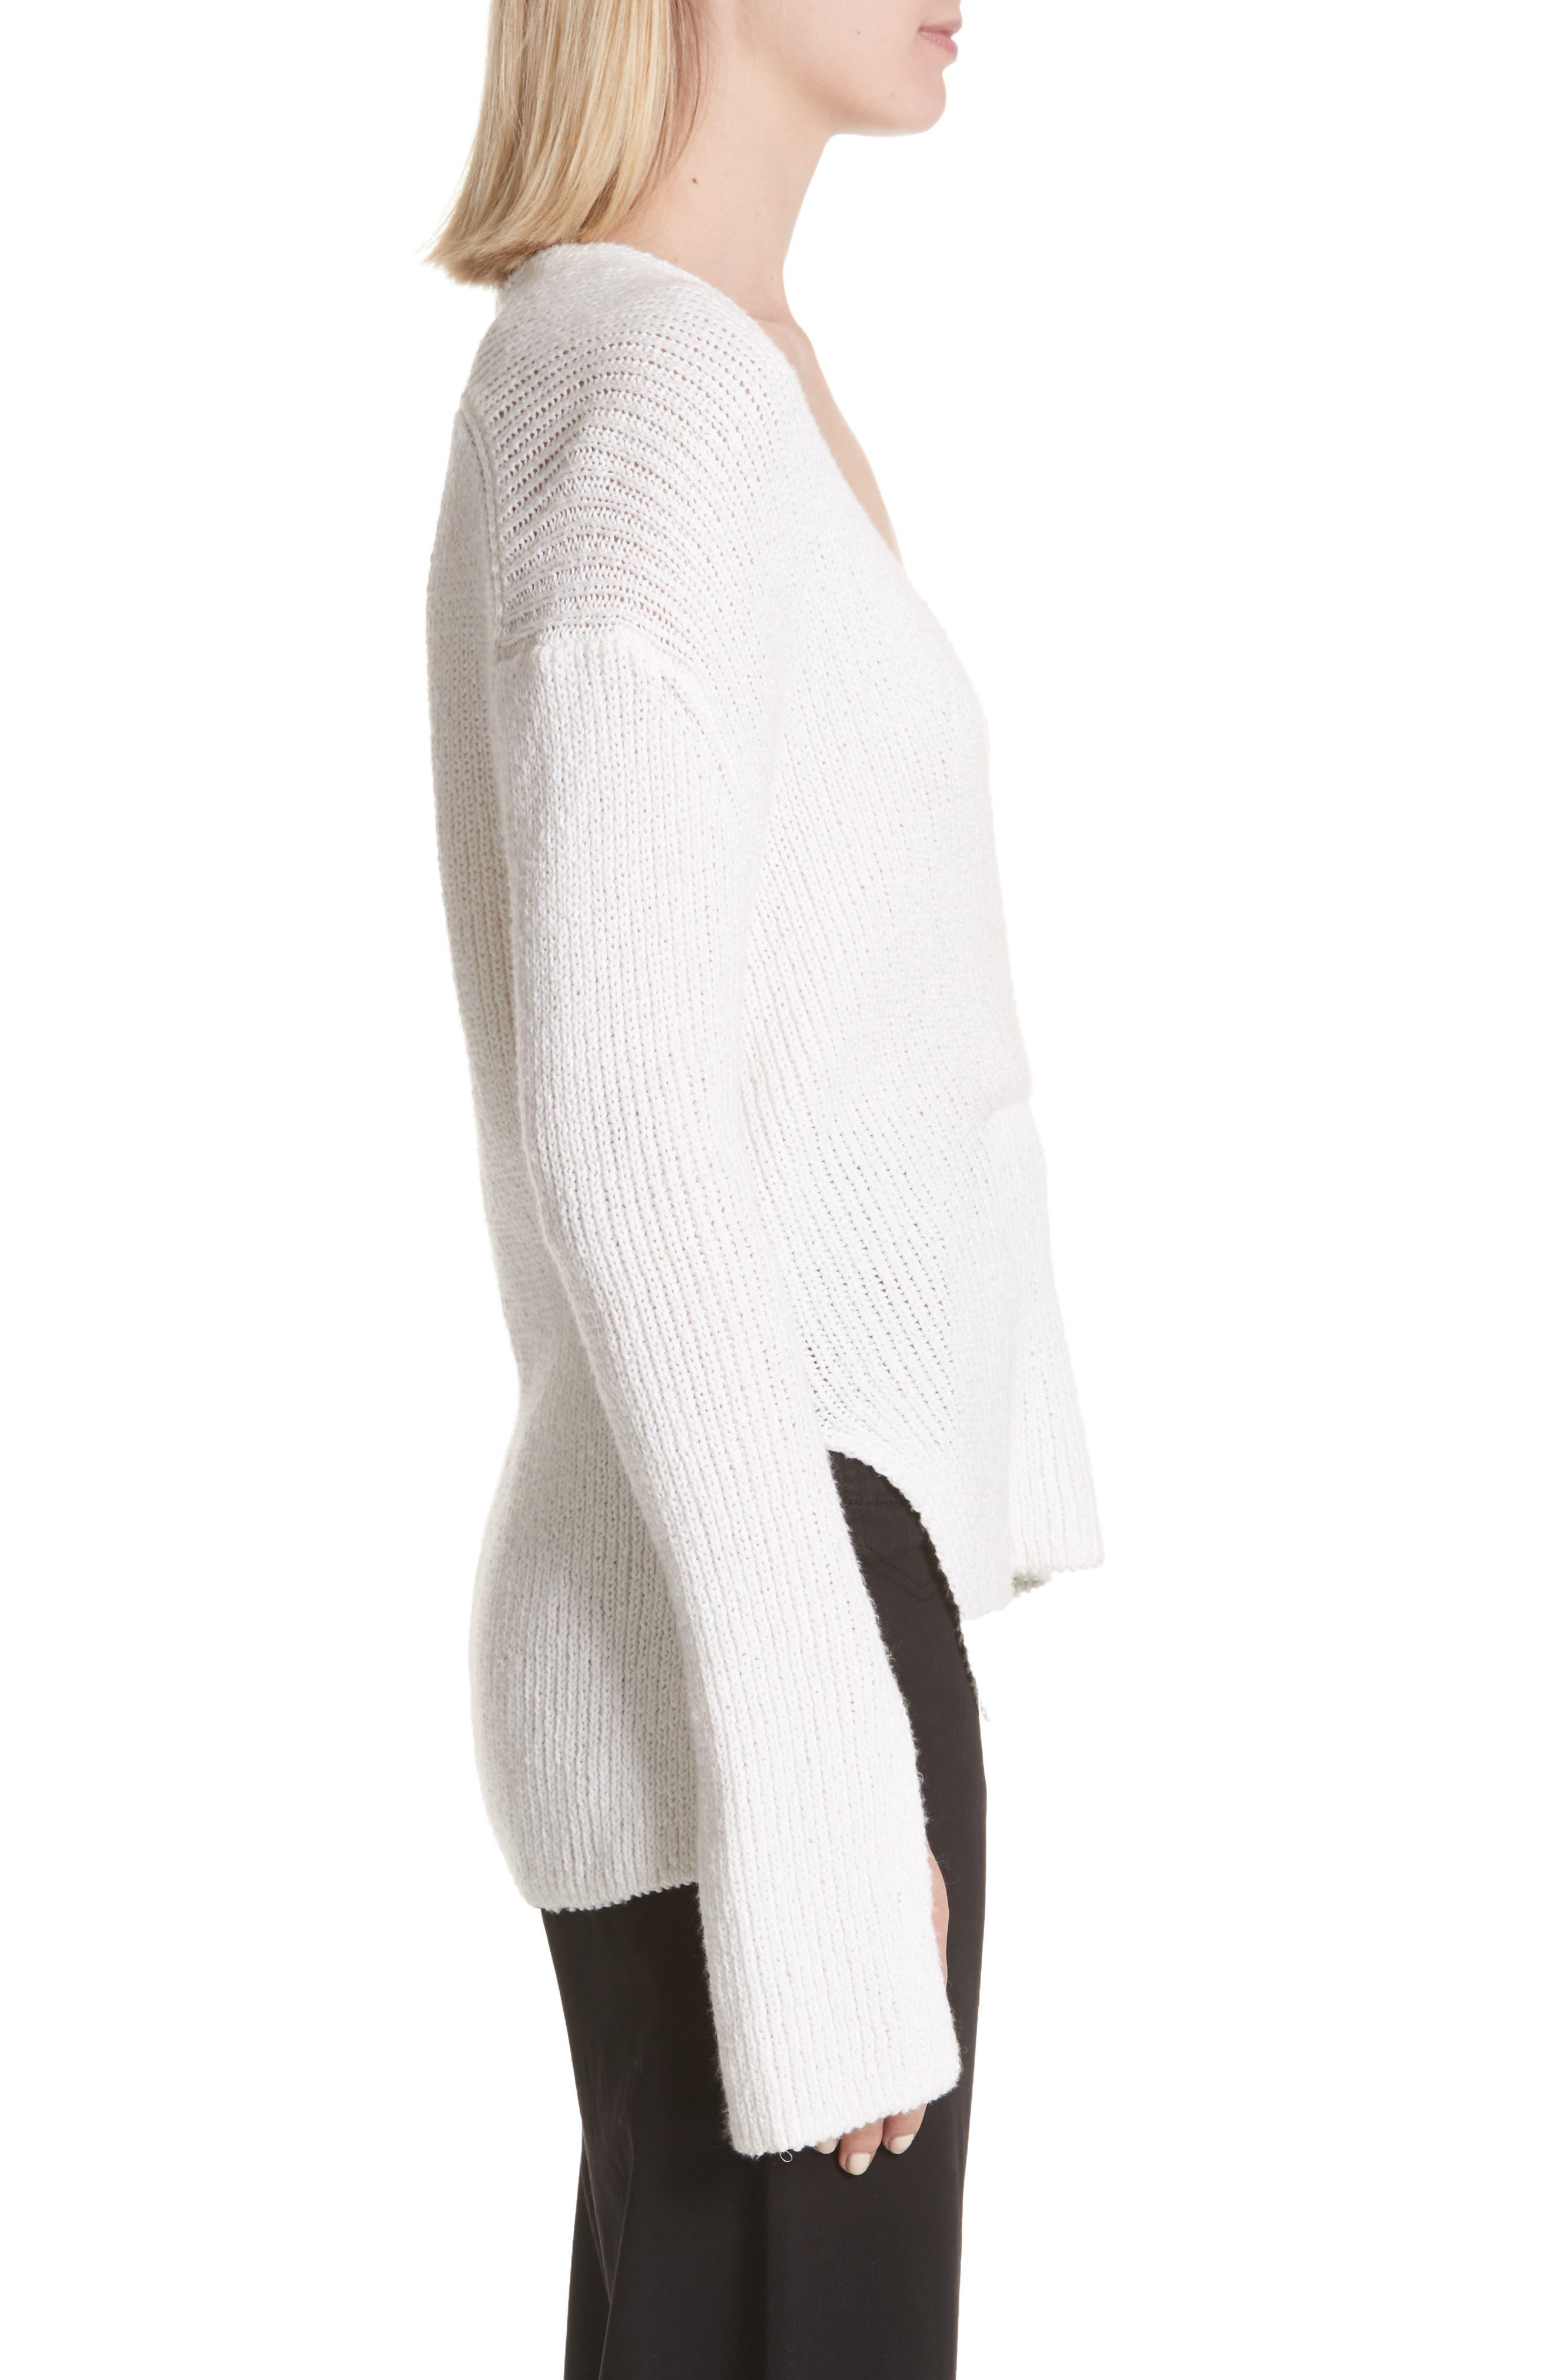 Nick Cotton Sweater,                             Alternate thumbnail 3, color,                             White